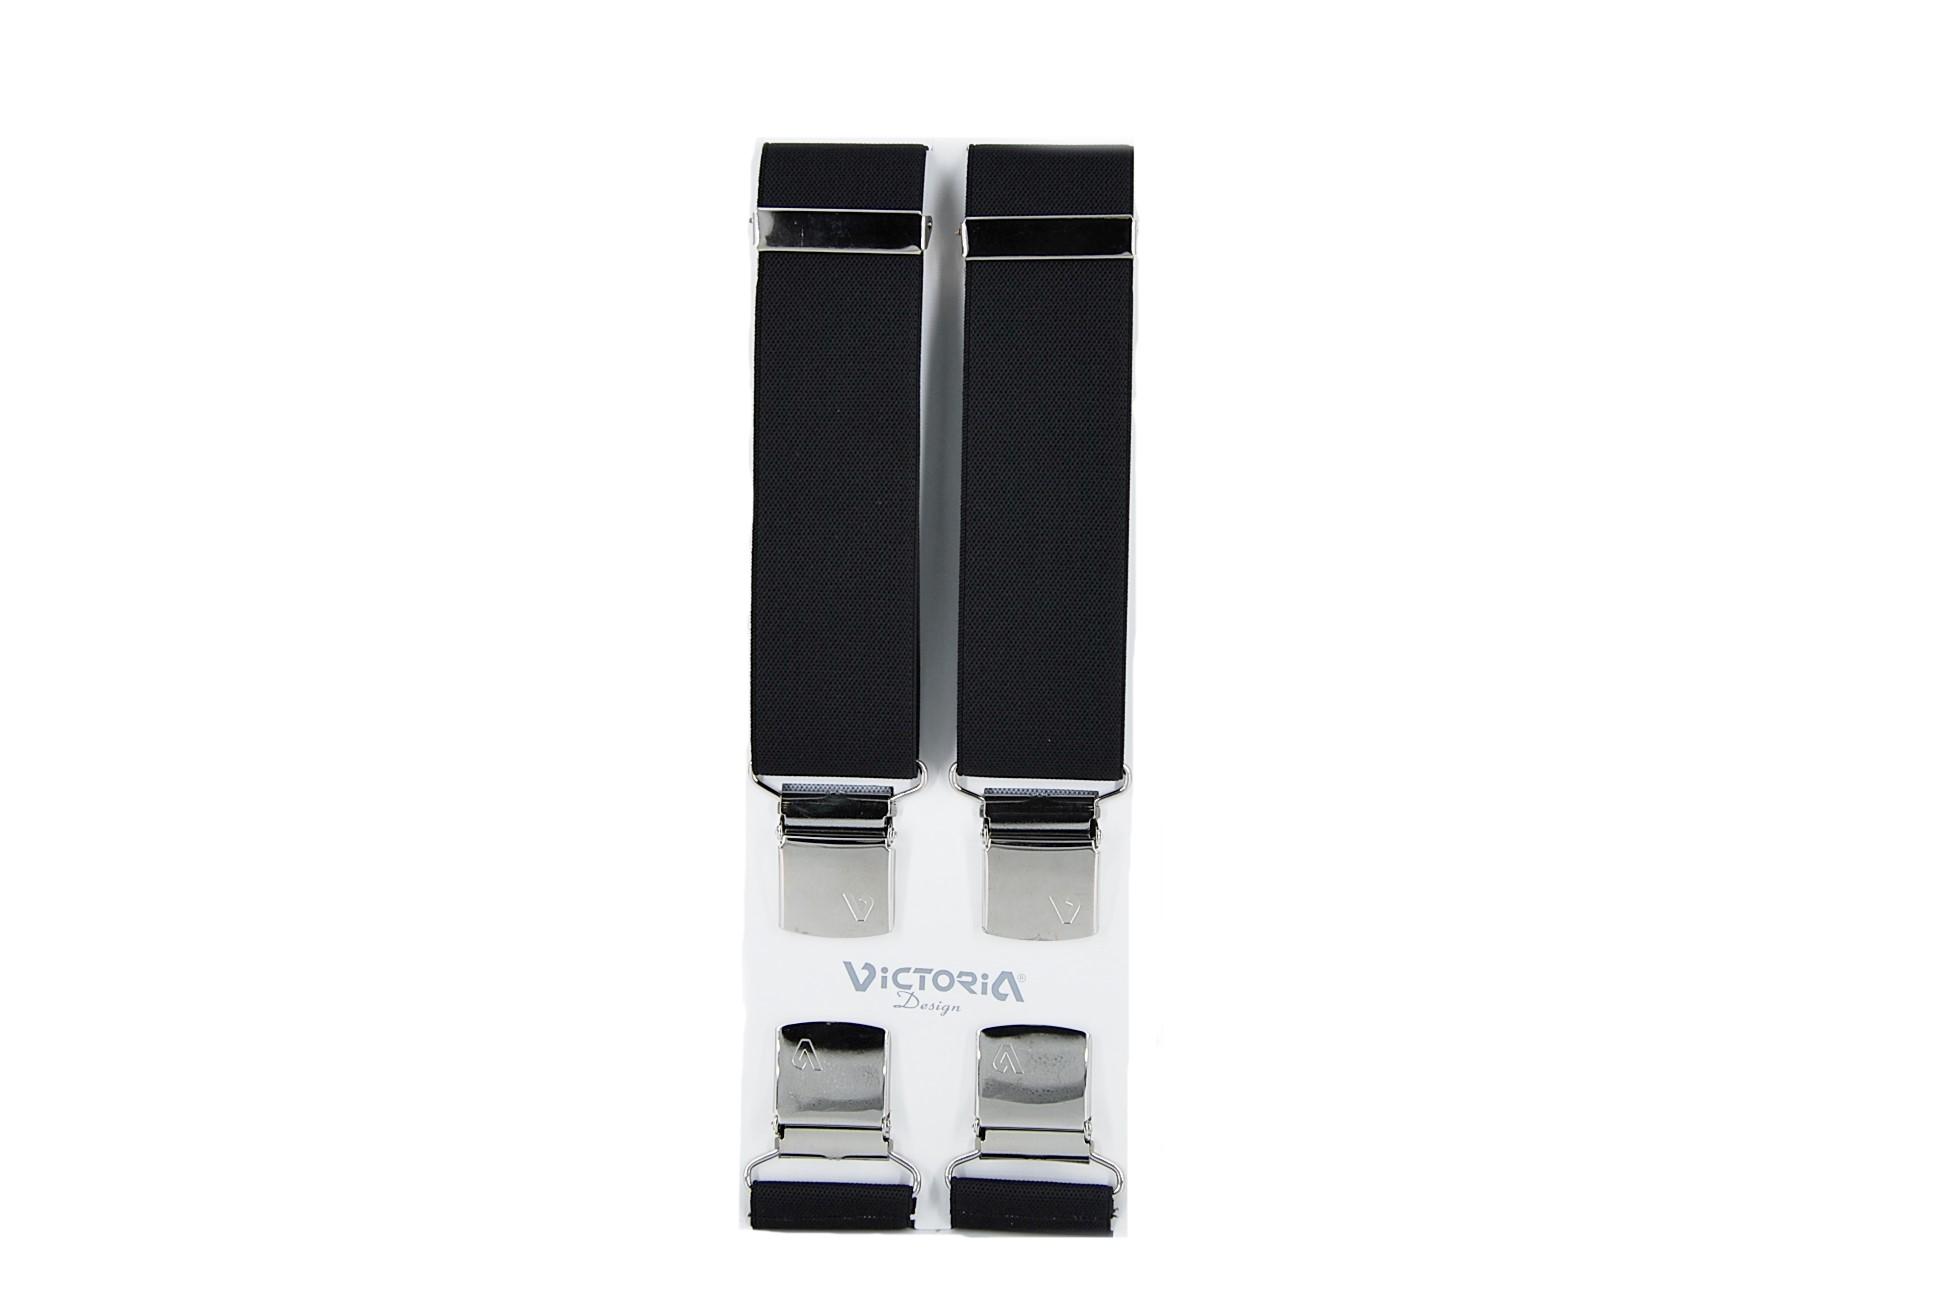 89bdd897902 Victoria ανδρικές τιράντες μαύρες | Εισαγωγική Accessories